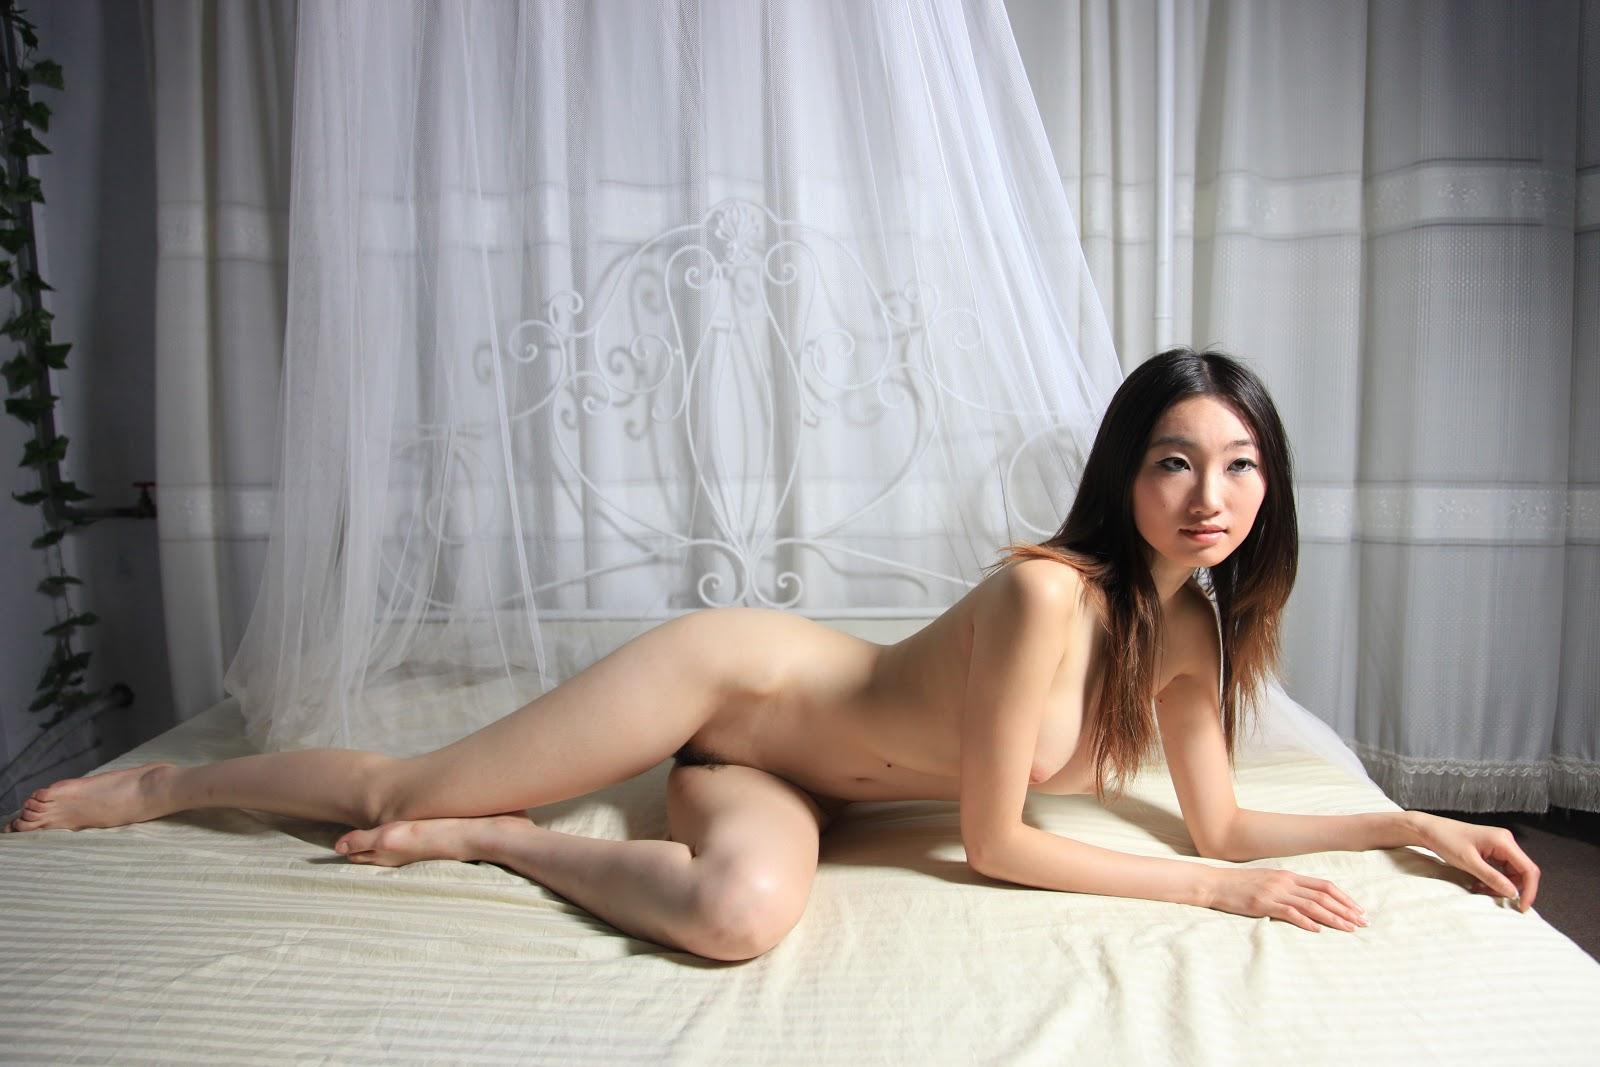 Chinese Nude_Art_Photos_-_210_-_XiaoDan.rar Chinese_Nude_Art_Photos_-_210_-_XiaoDan.rar.DSC_0057